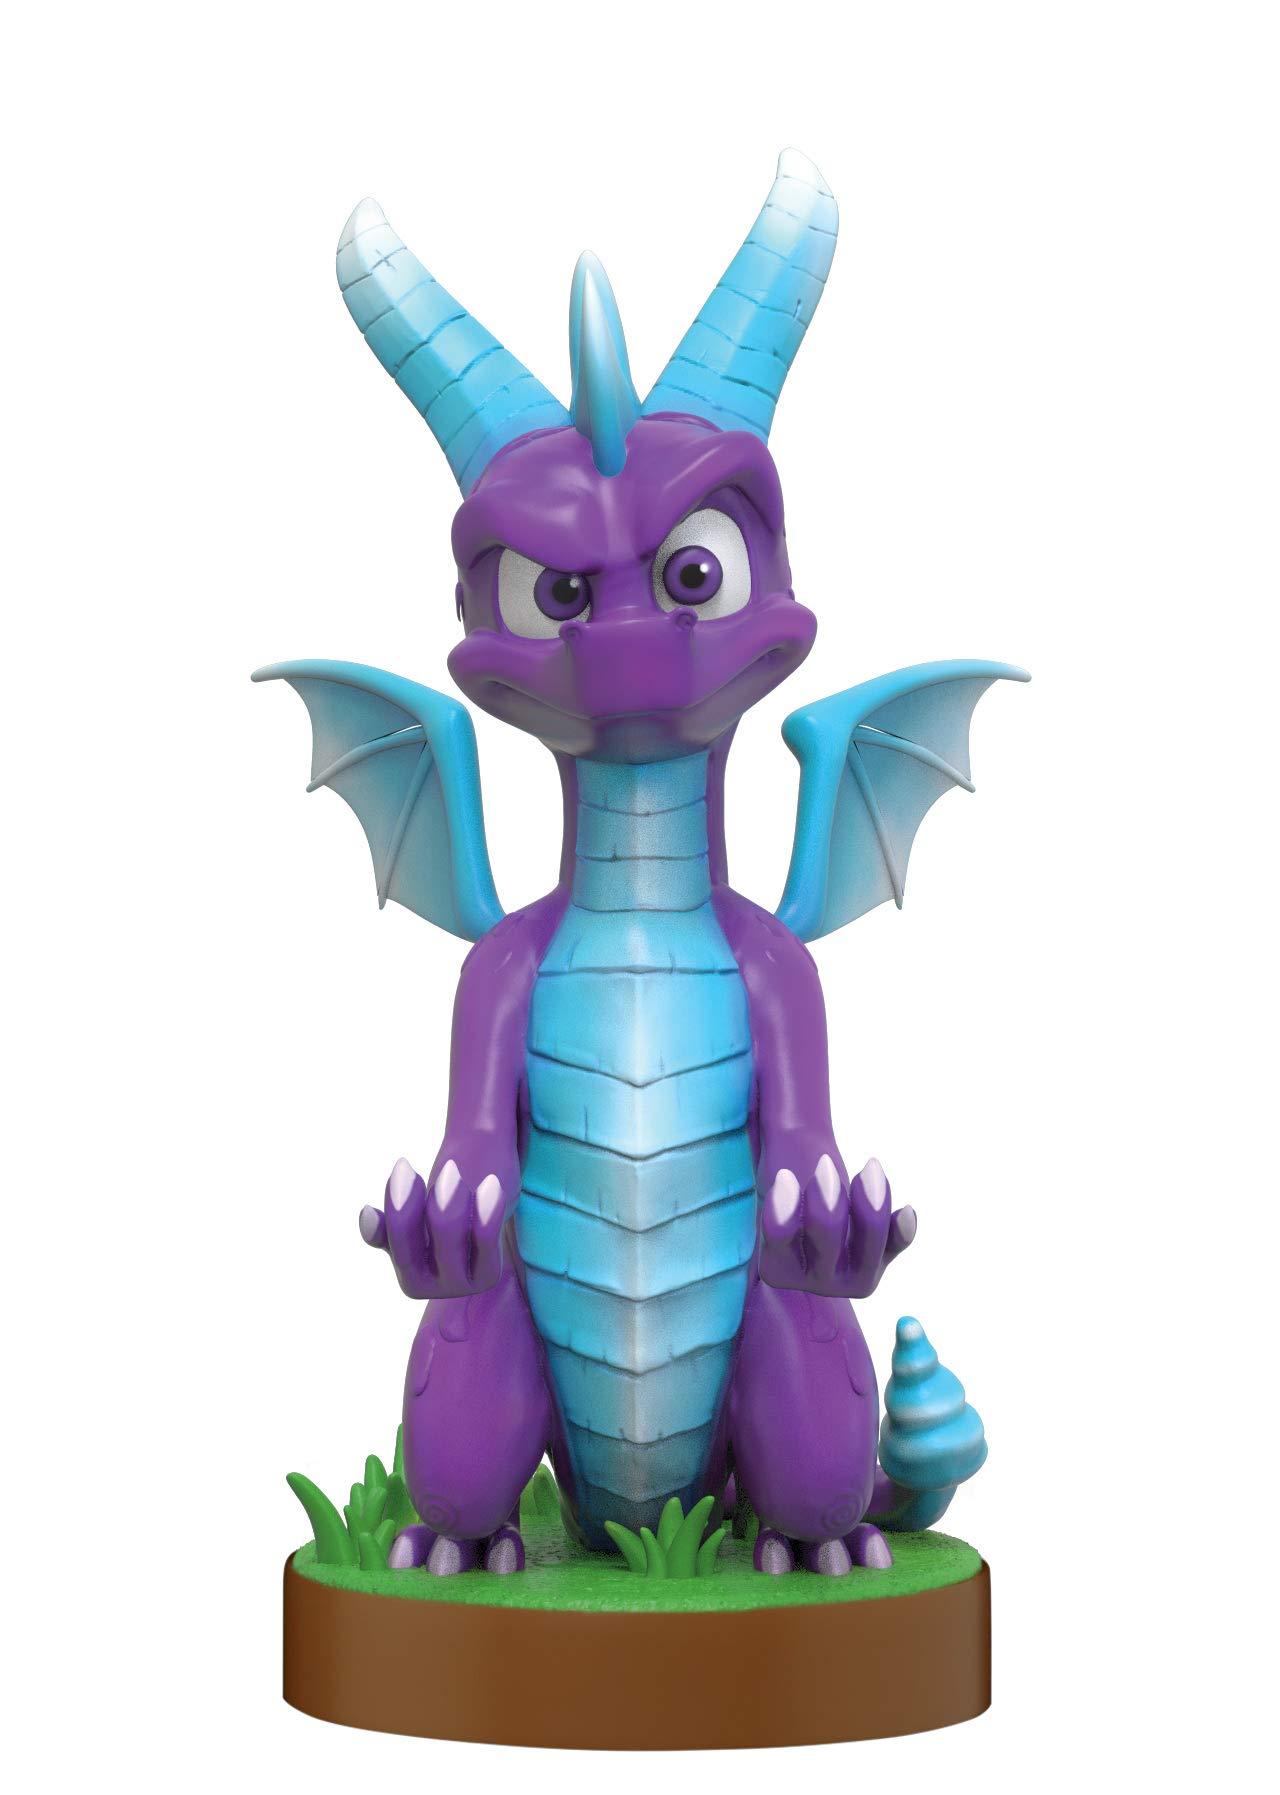 Spyro the Dragon Cable Guy Ice Spyro 20 cm